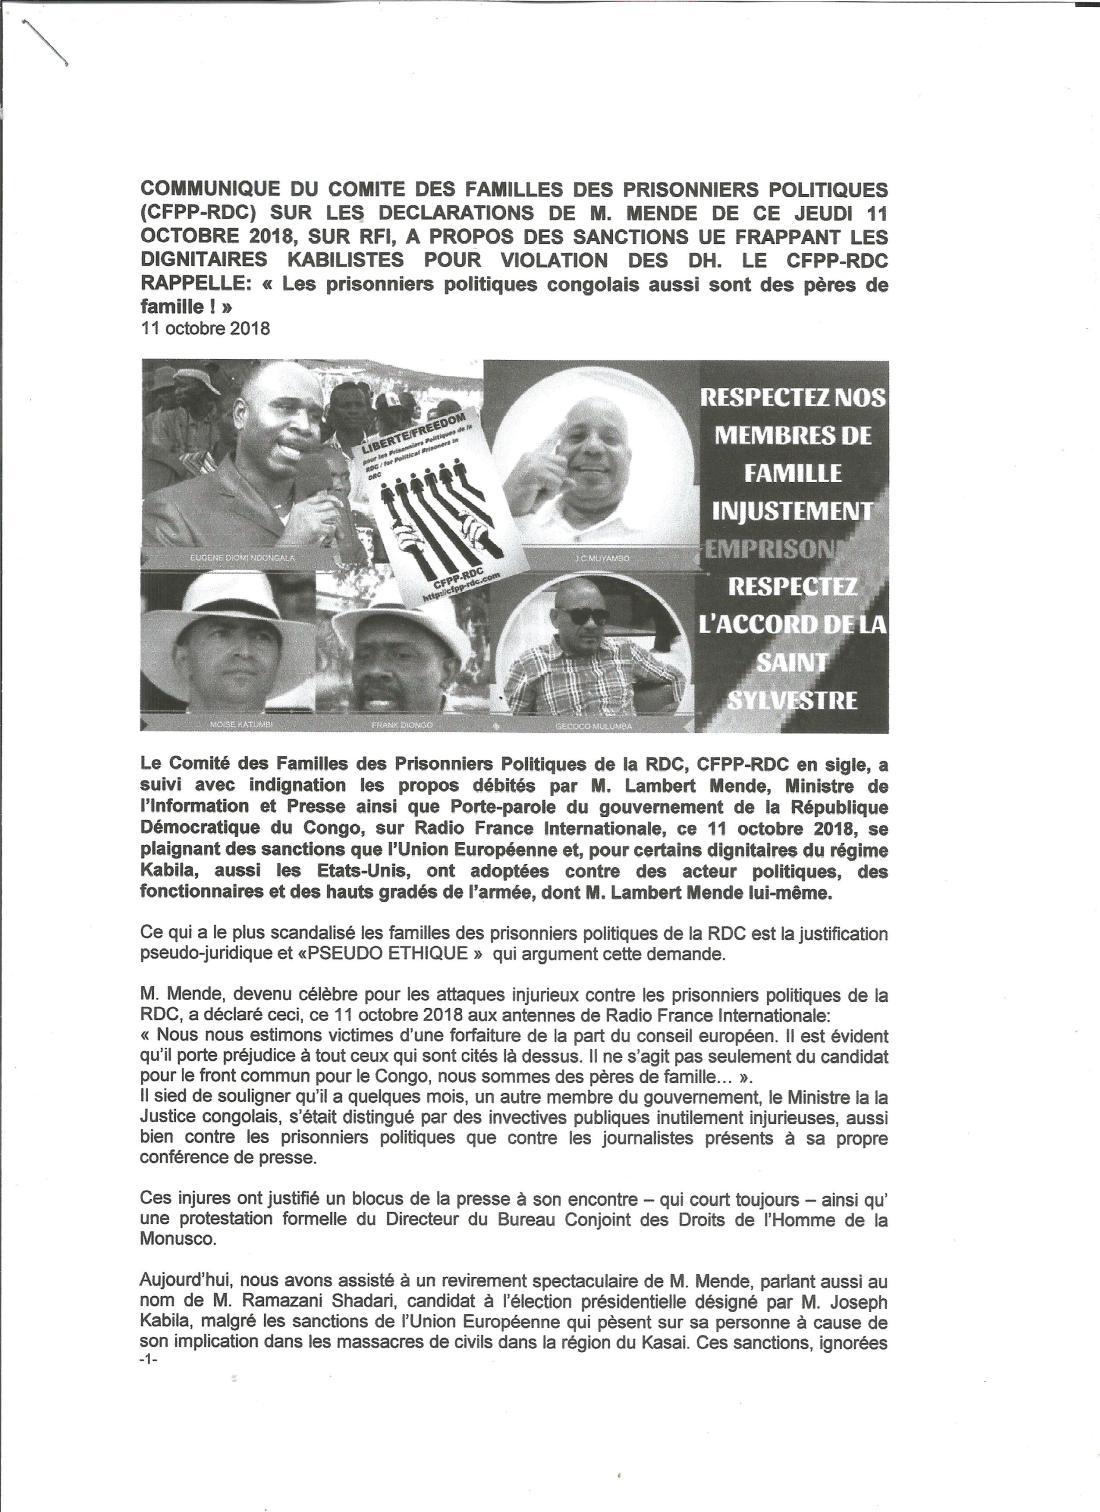 LETTRE A SEM L AMBASSADEUR UE - CFFP 1610180003